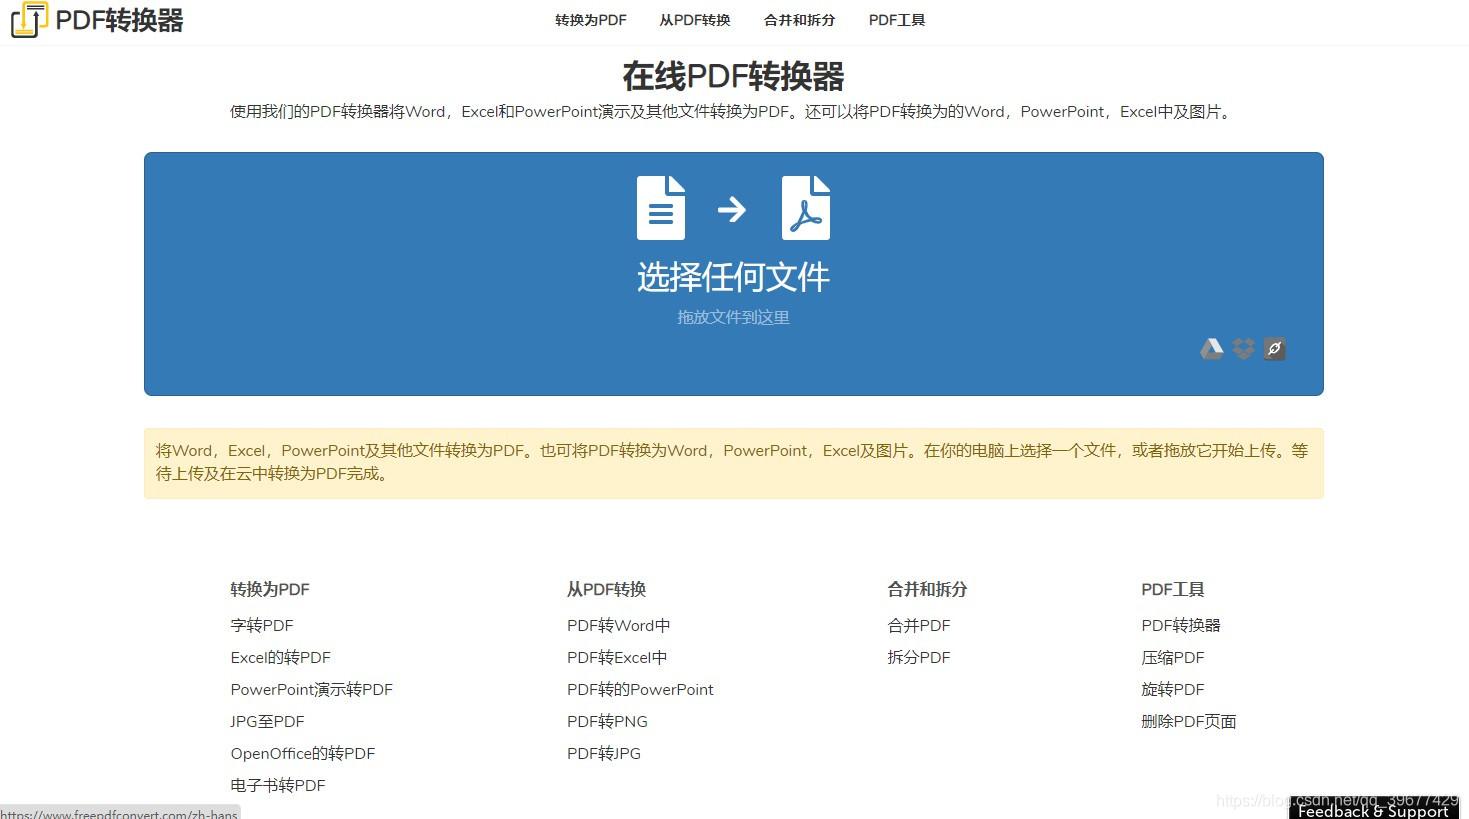 FreePdfConvert PDF 转换器